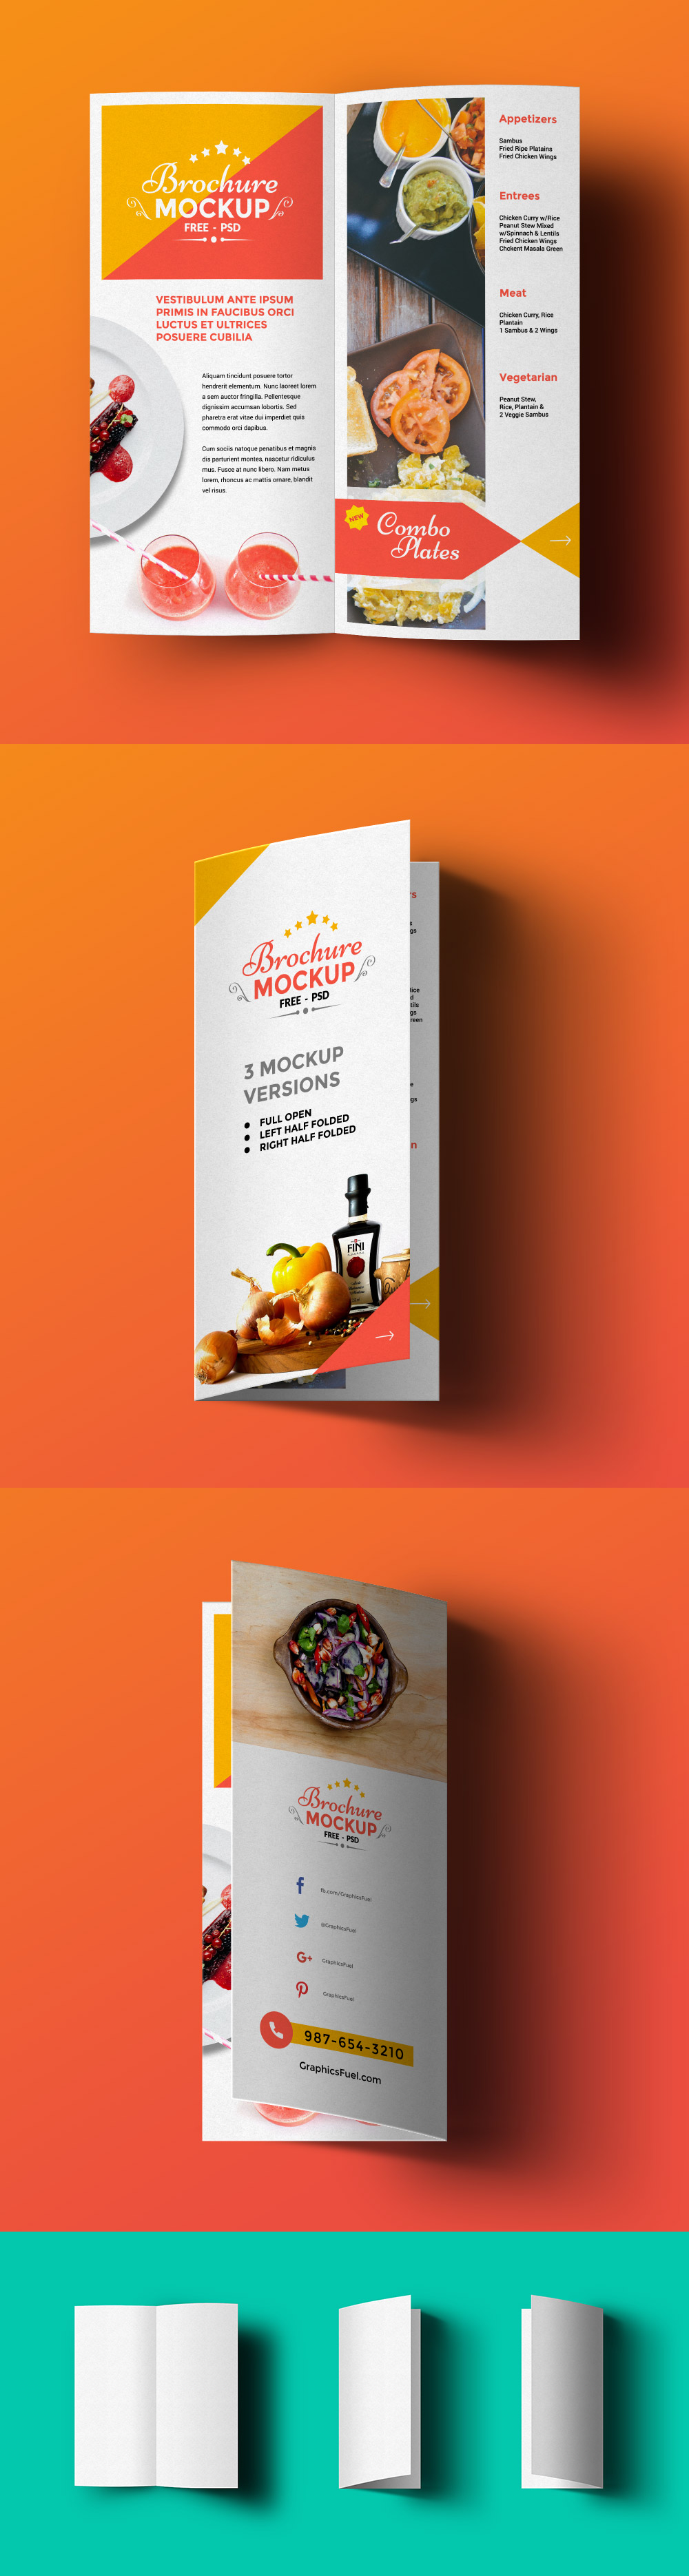 3 fold brochure template psd free download - free bi fold brochure mockup graphicsfuel